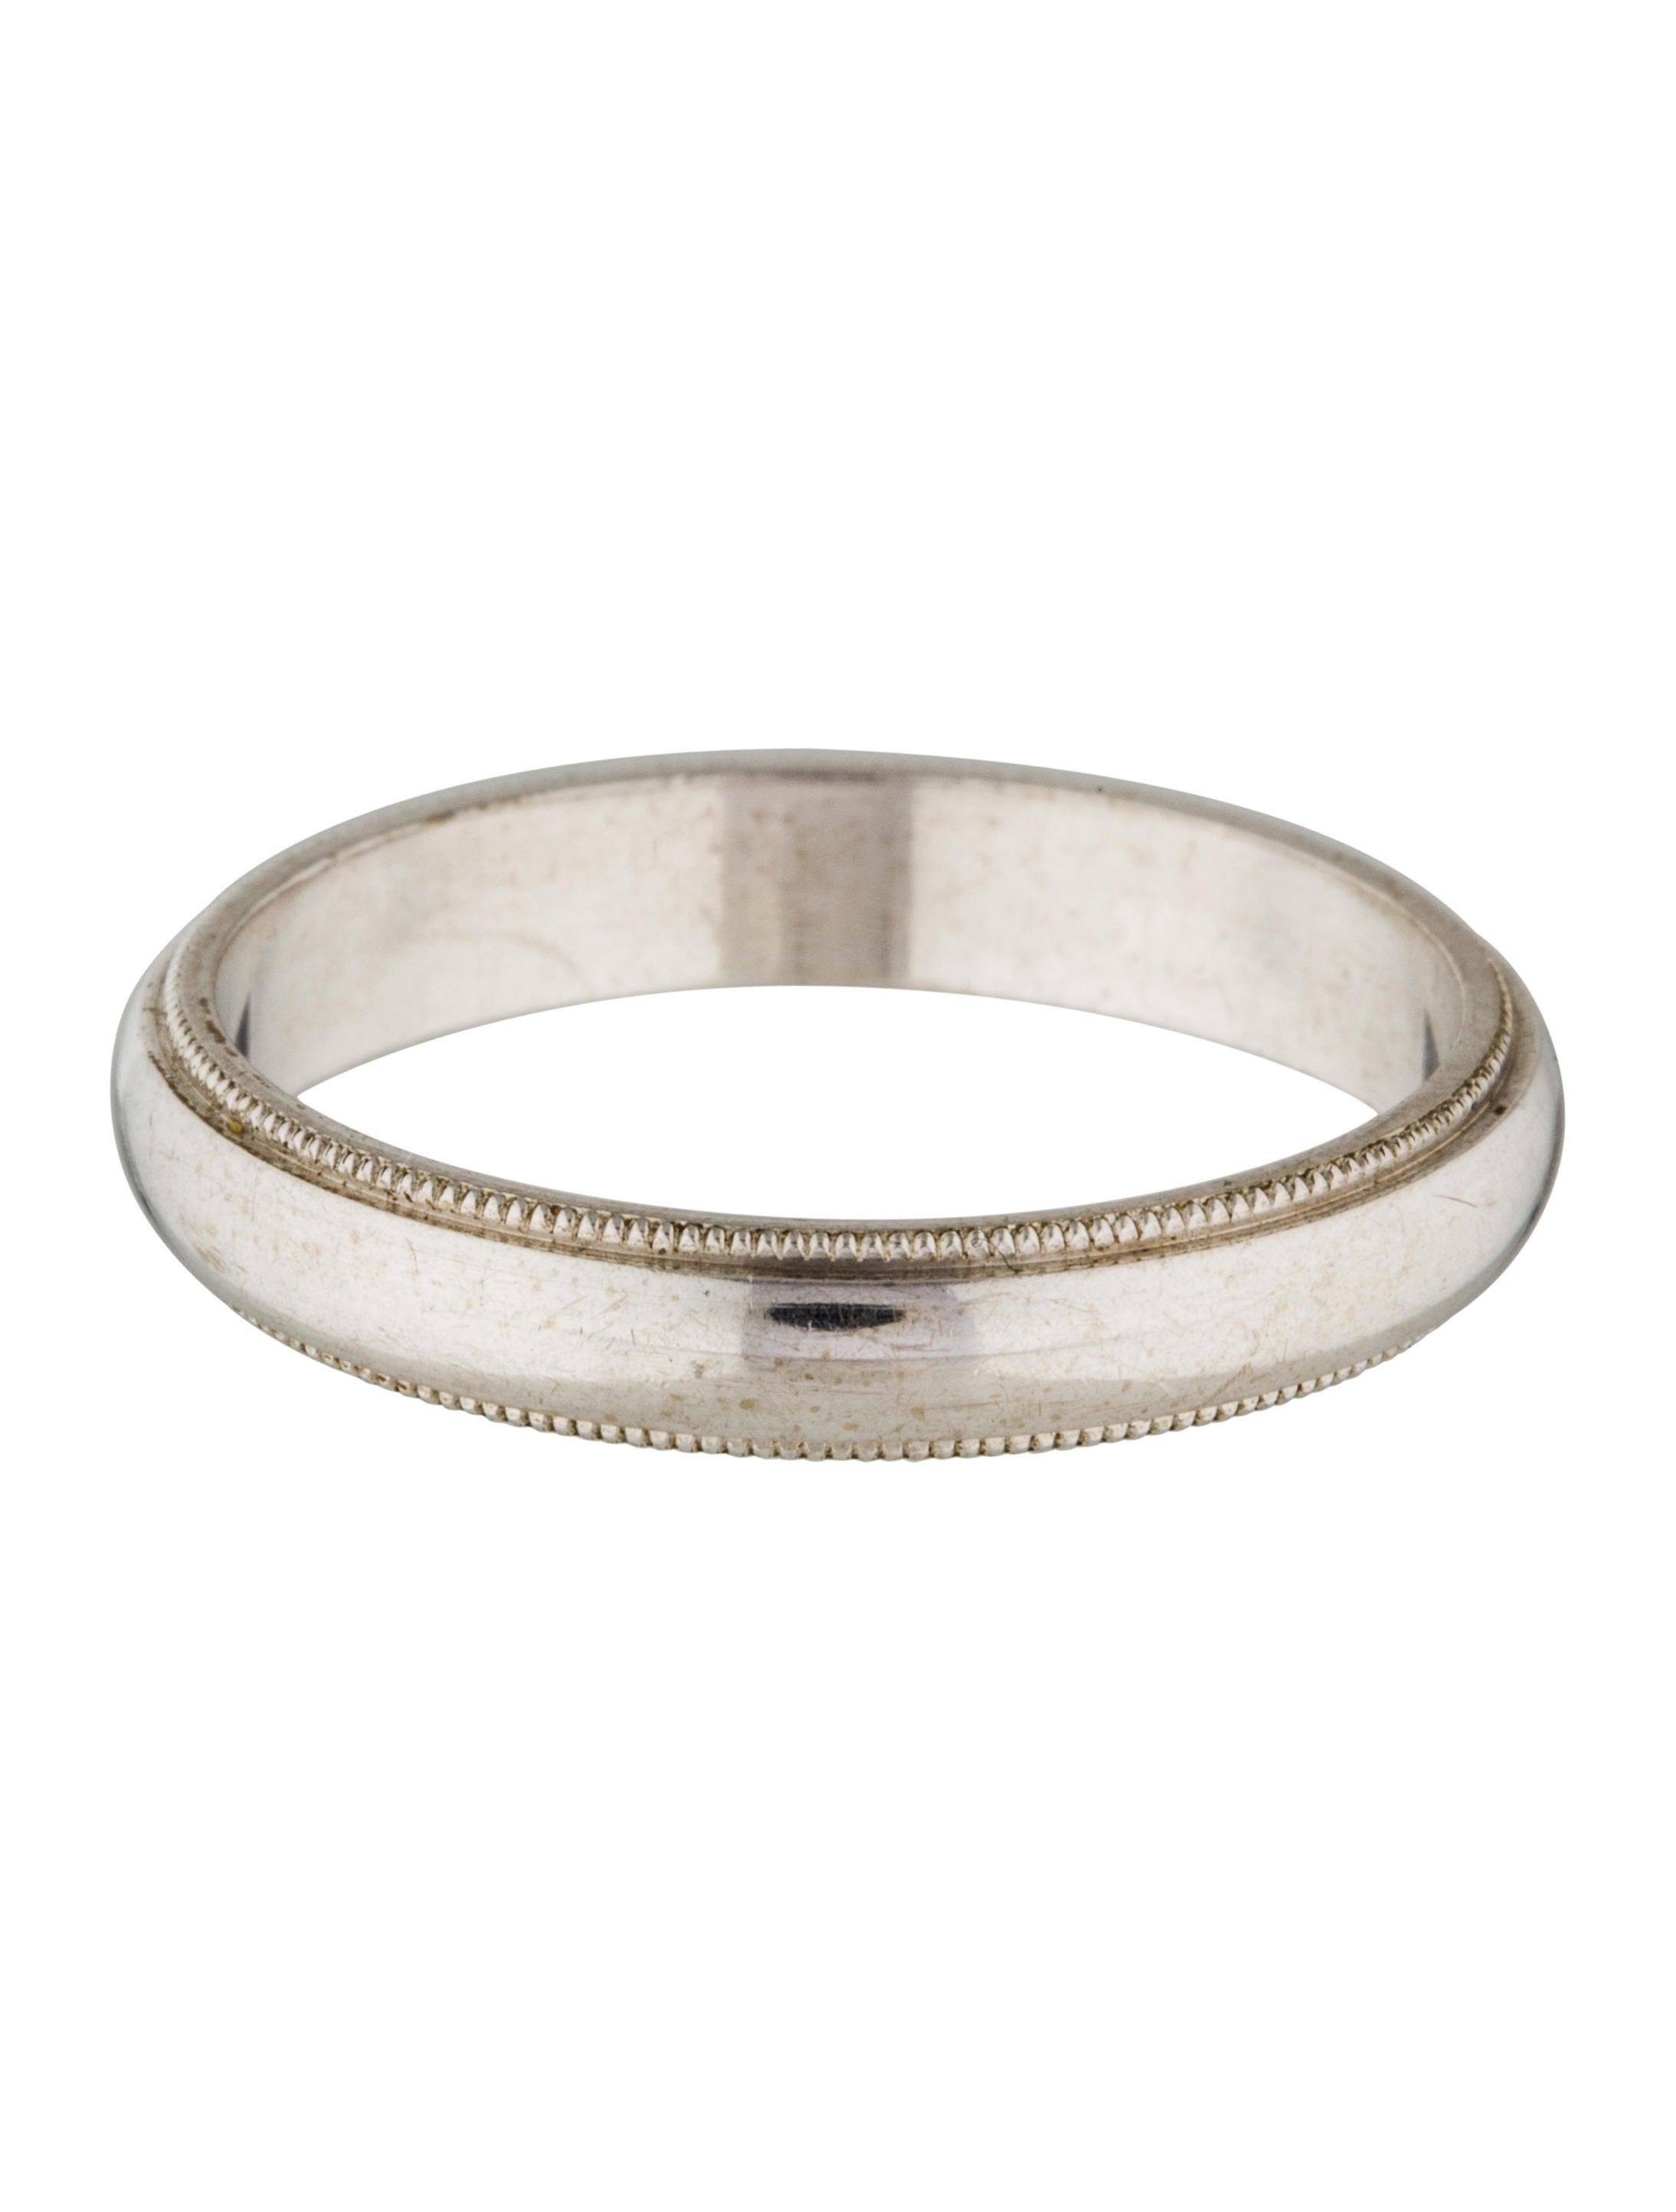 14k milgrain wedding band rings rring35828 the realreal